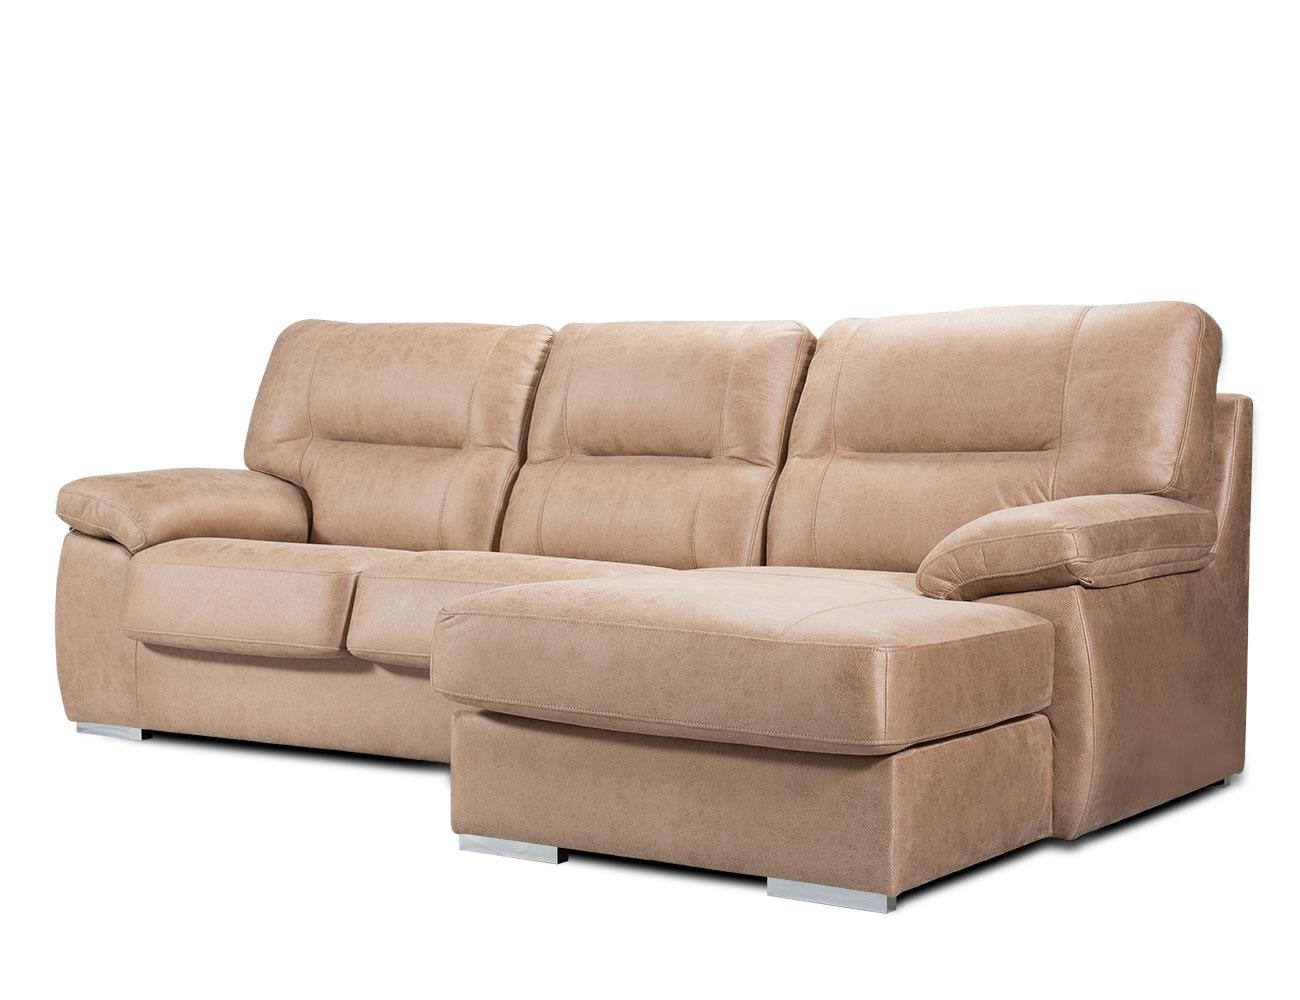 Sofa chaiselongue anti manchas